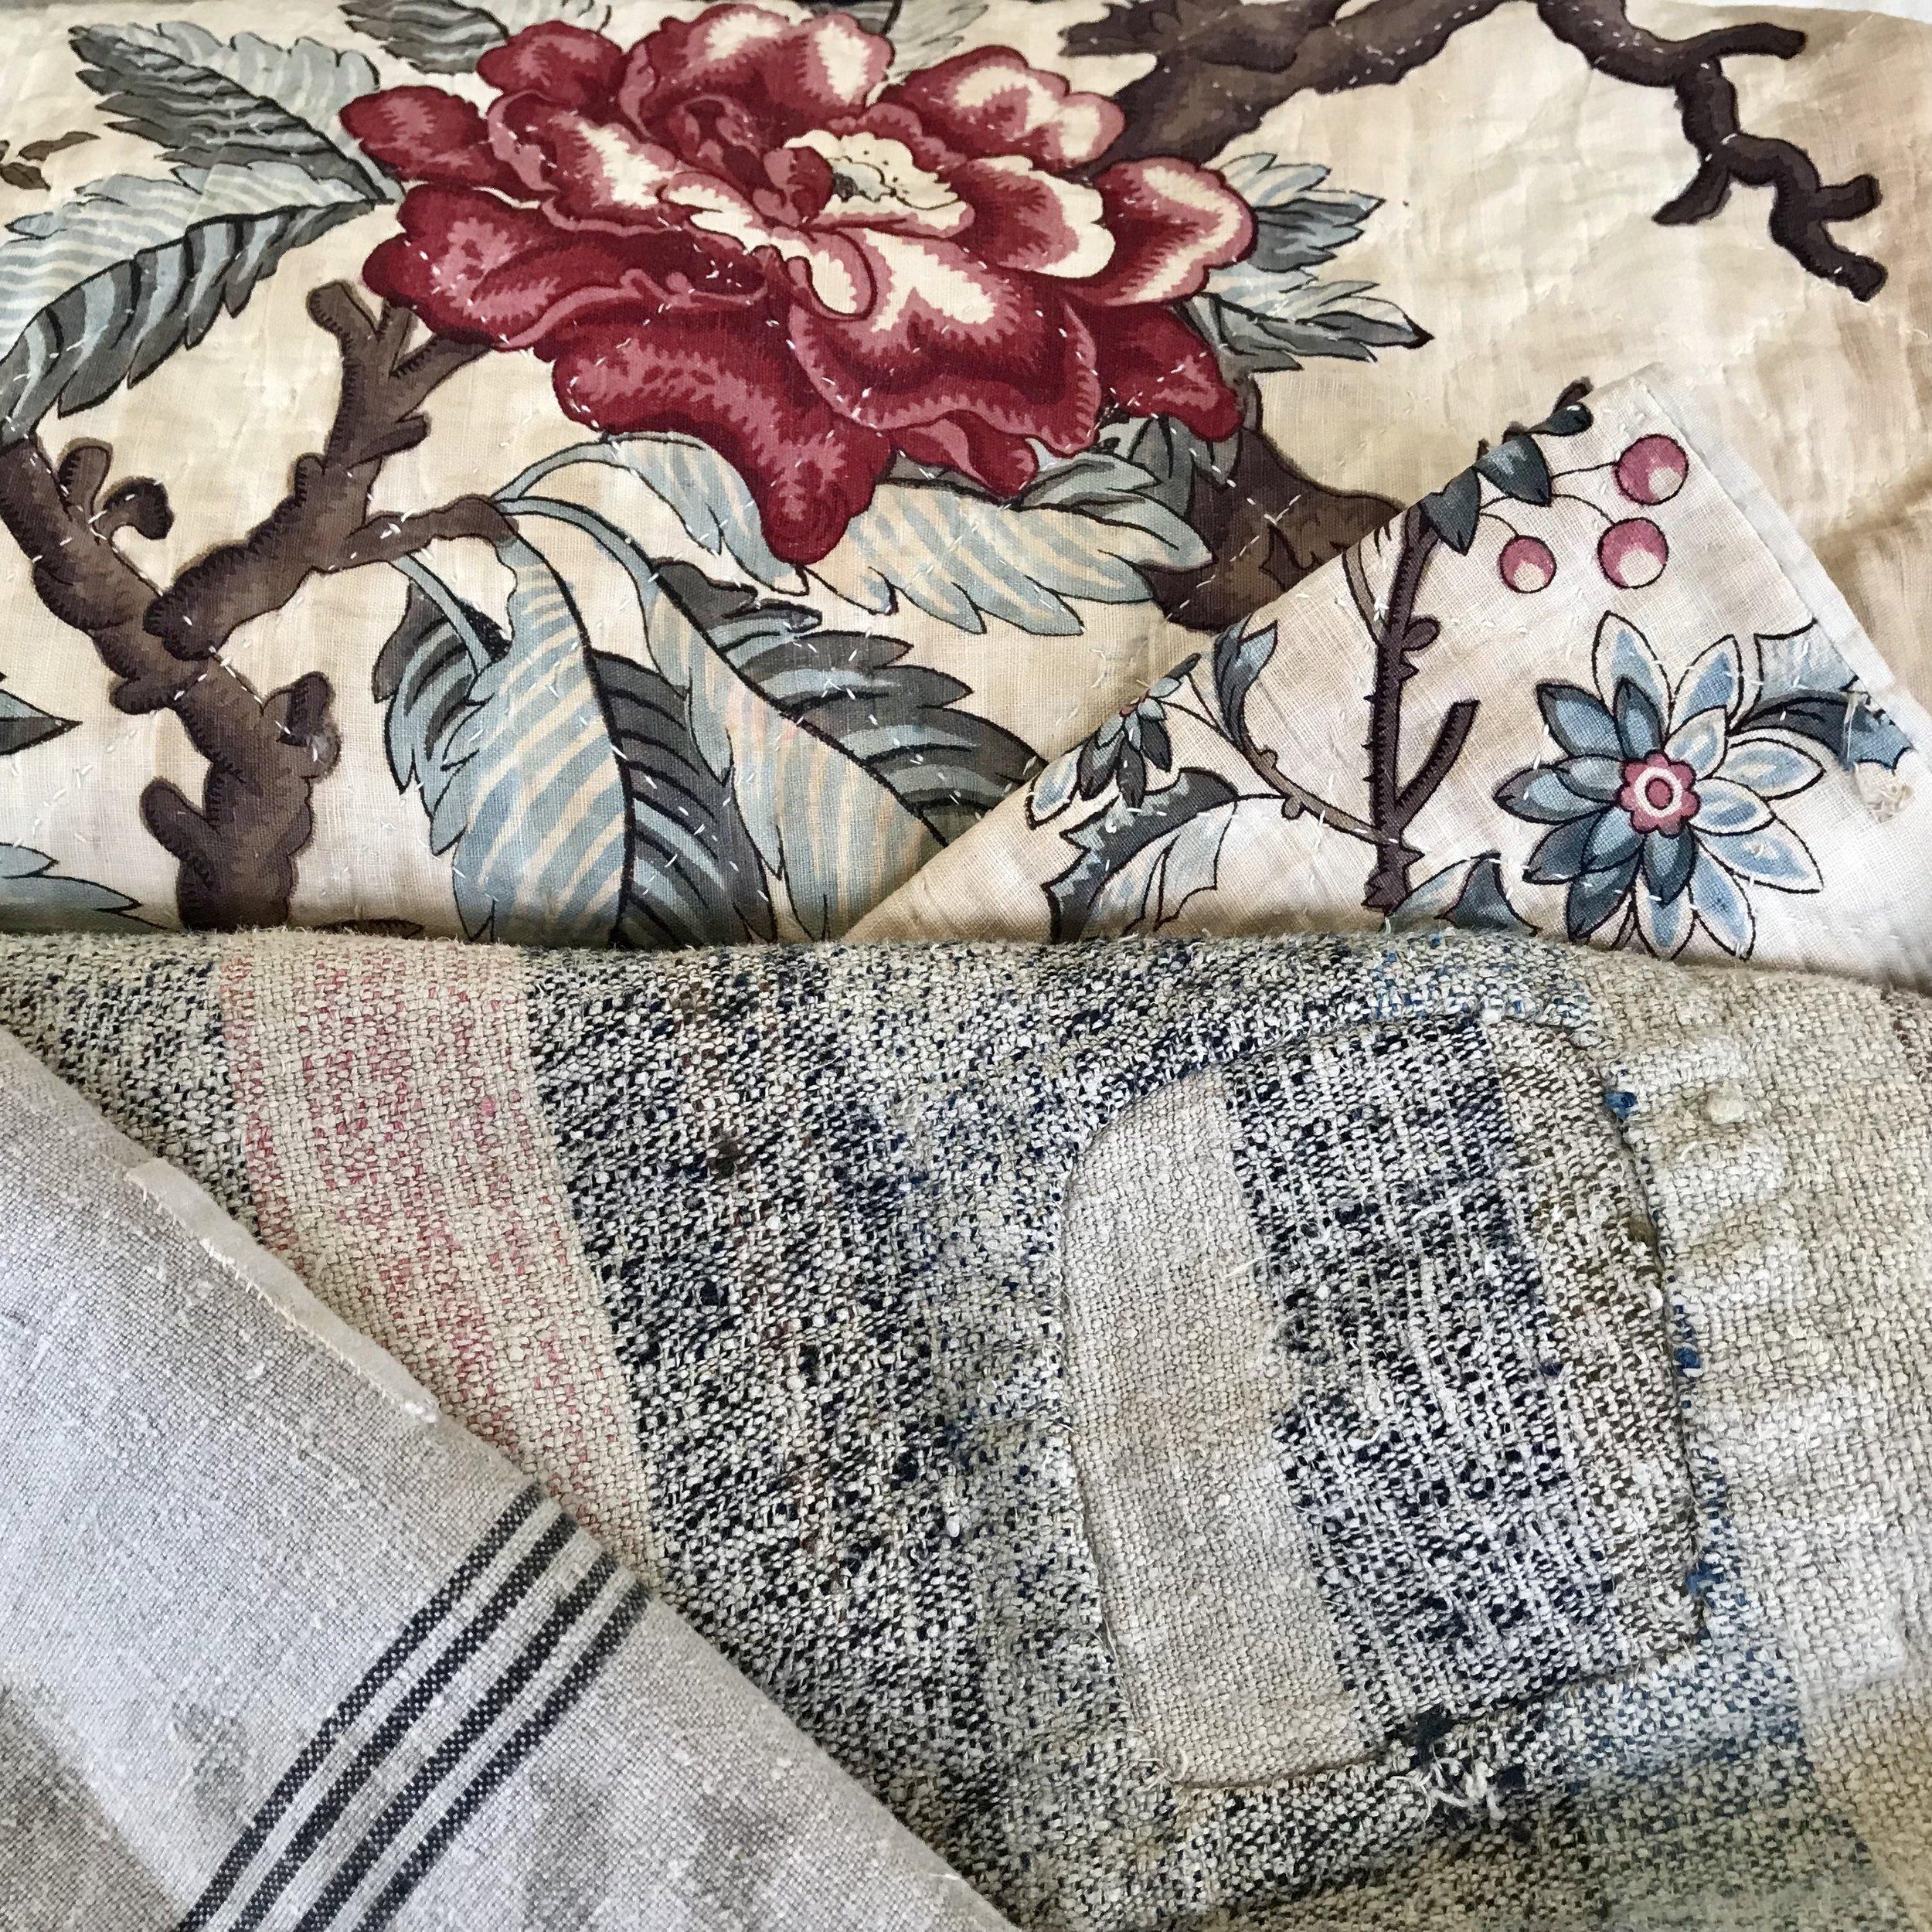 Brimfield Textile Show